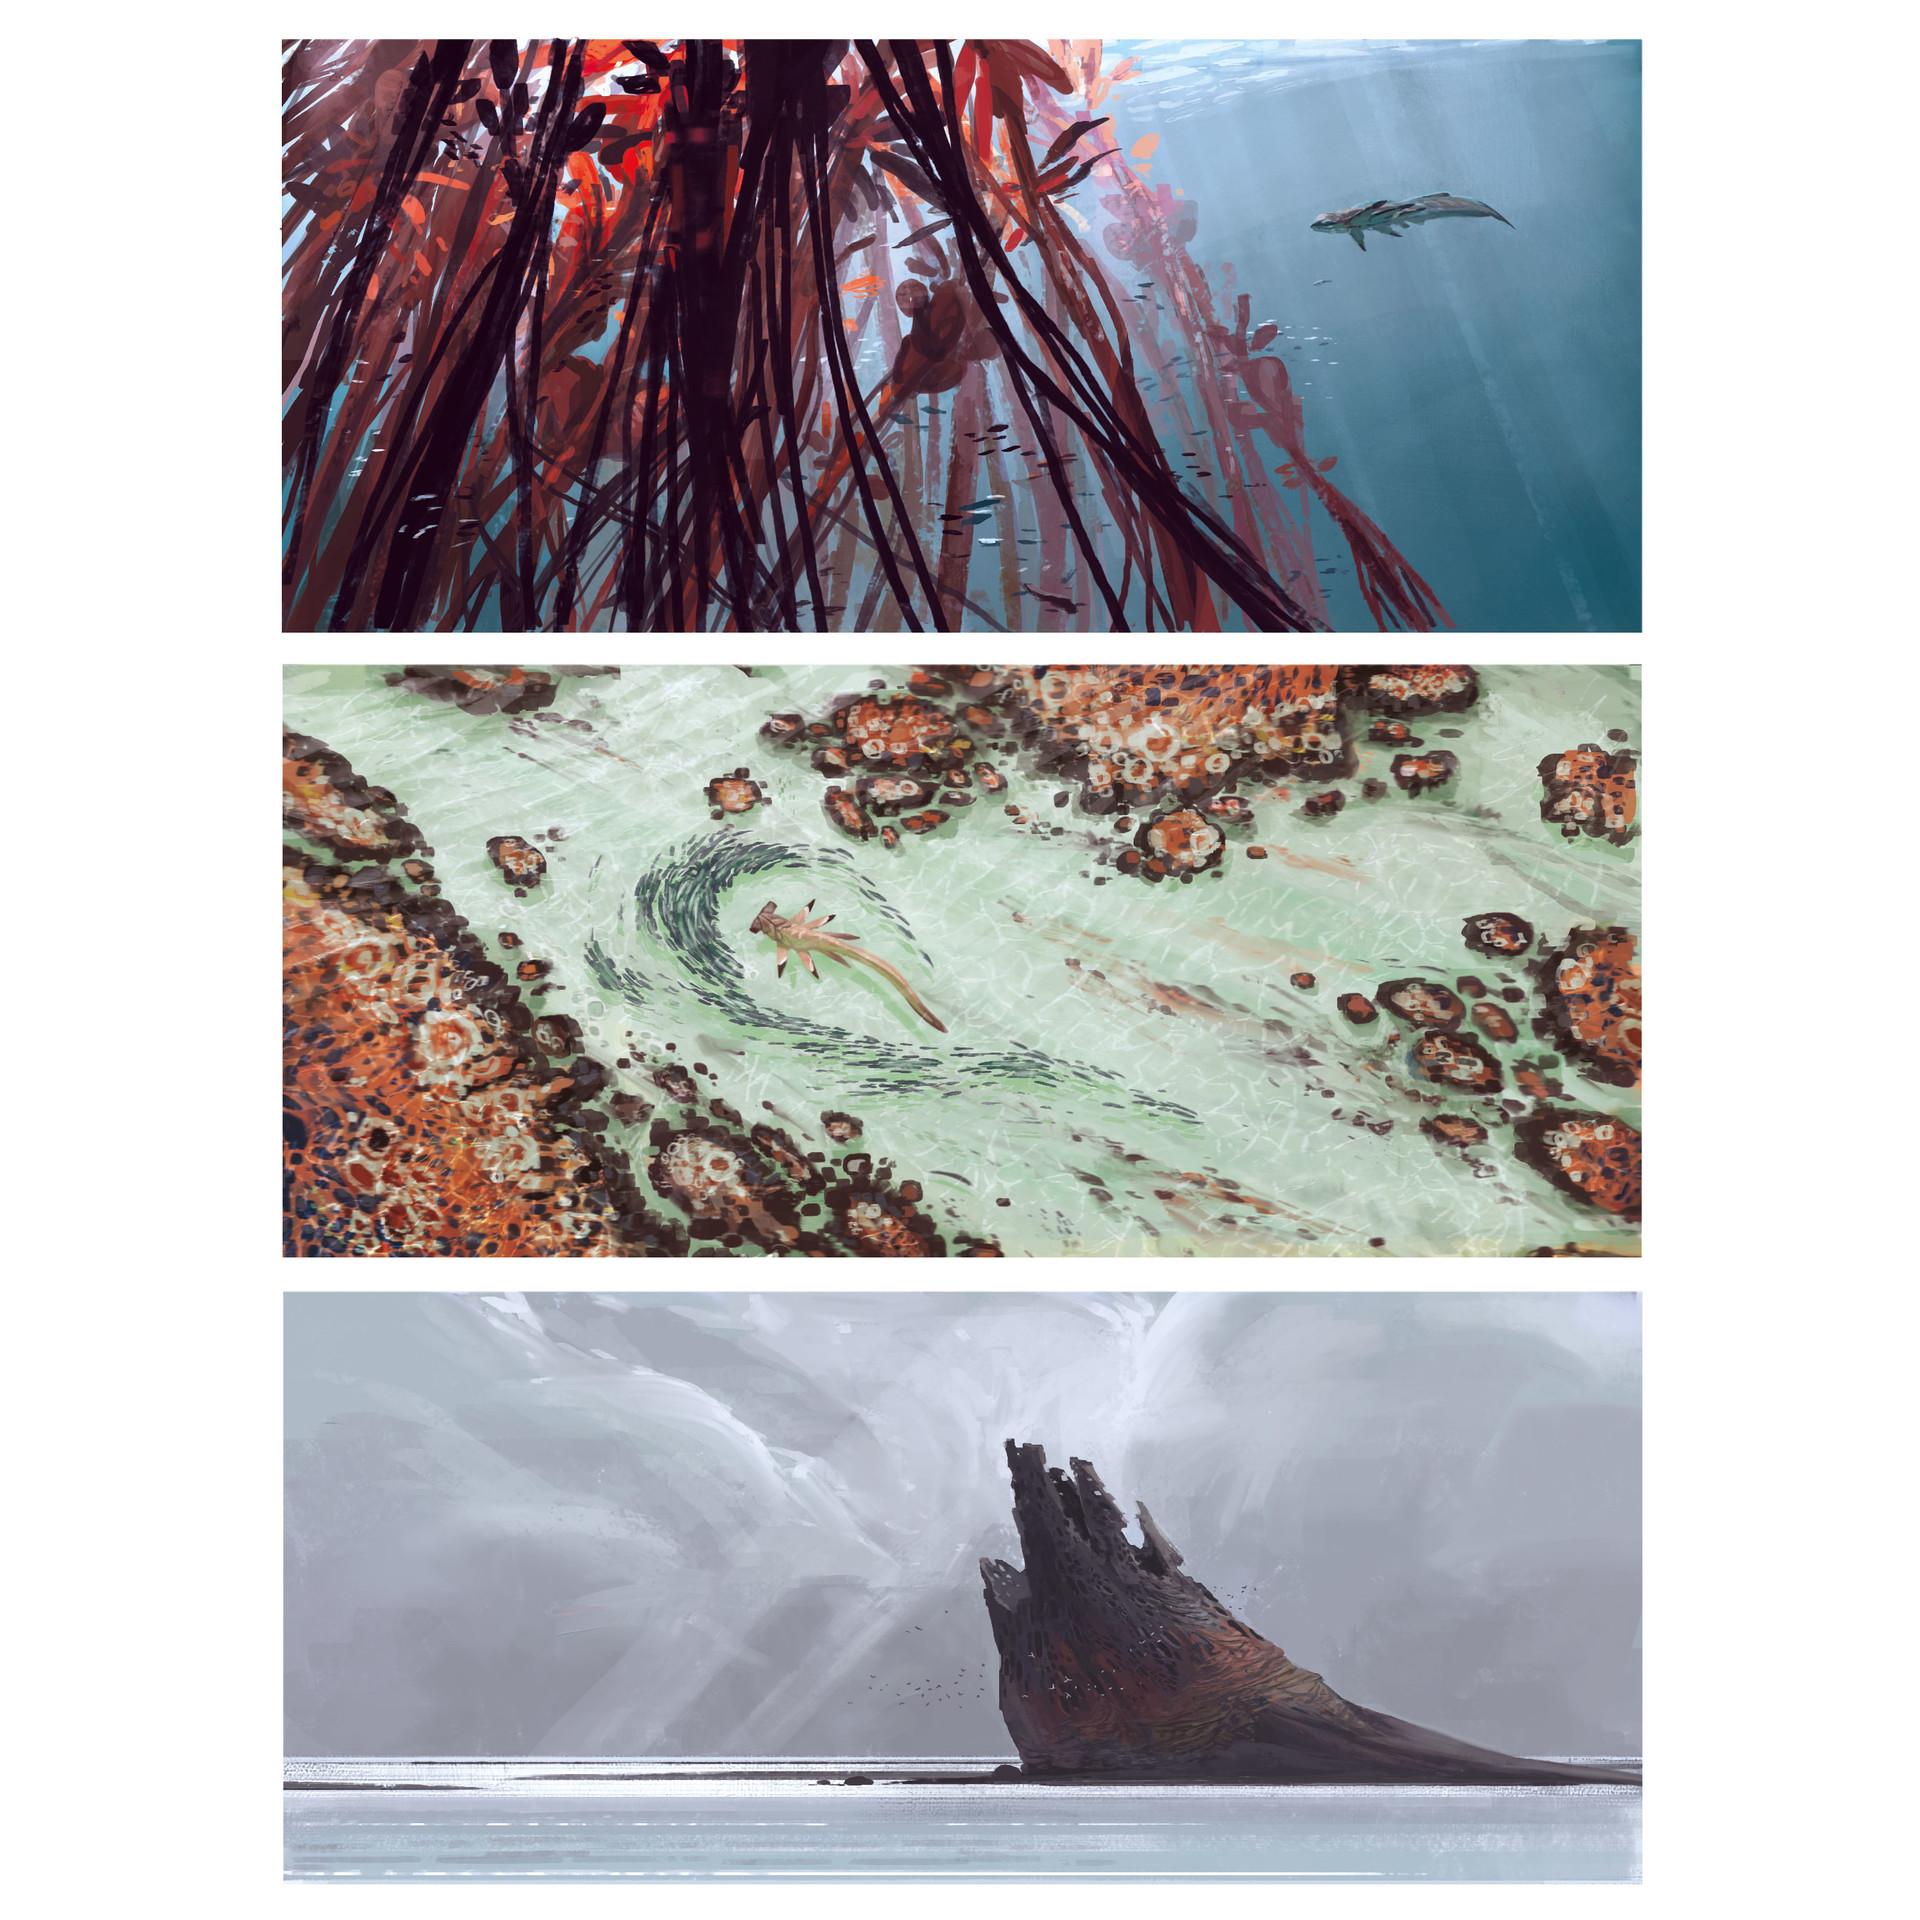 [Reflexion] Les oeuvres qui vous inspirent Alexander-ostrowski-05-sea-colorroughs-insta2